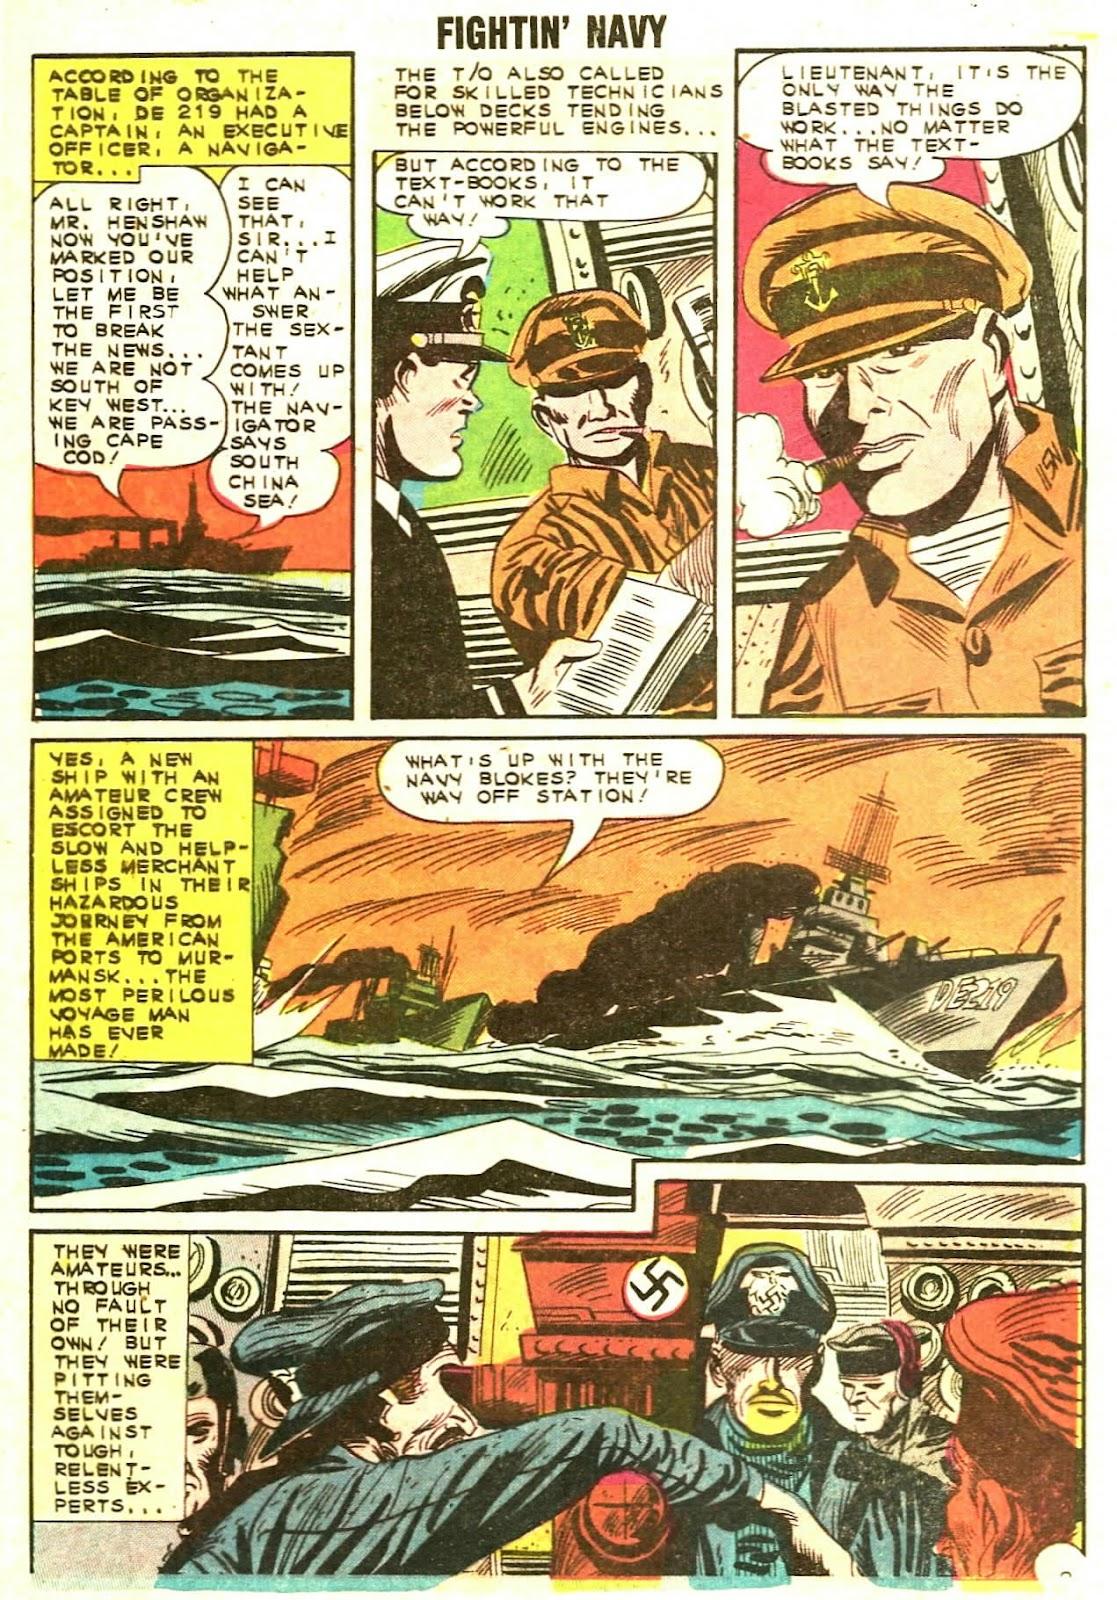 Read online Fightin' Navy comic -  Issue #110 - 4